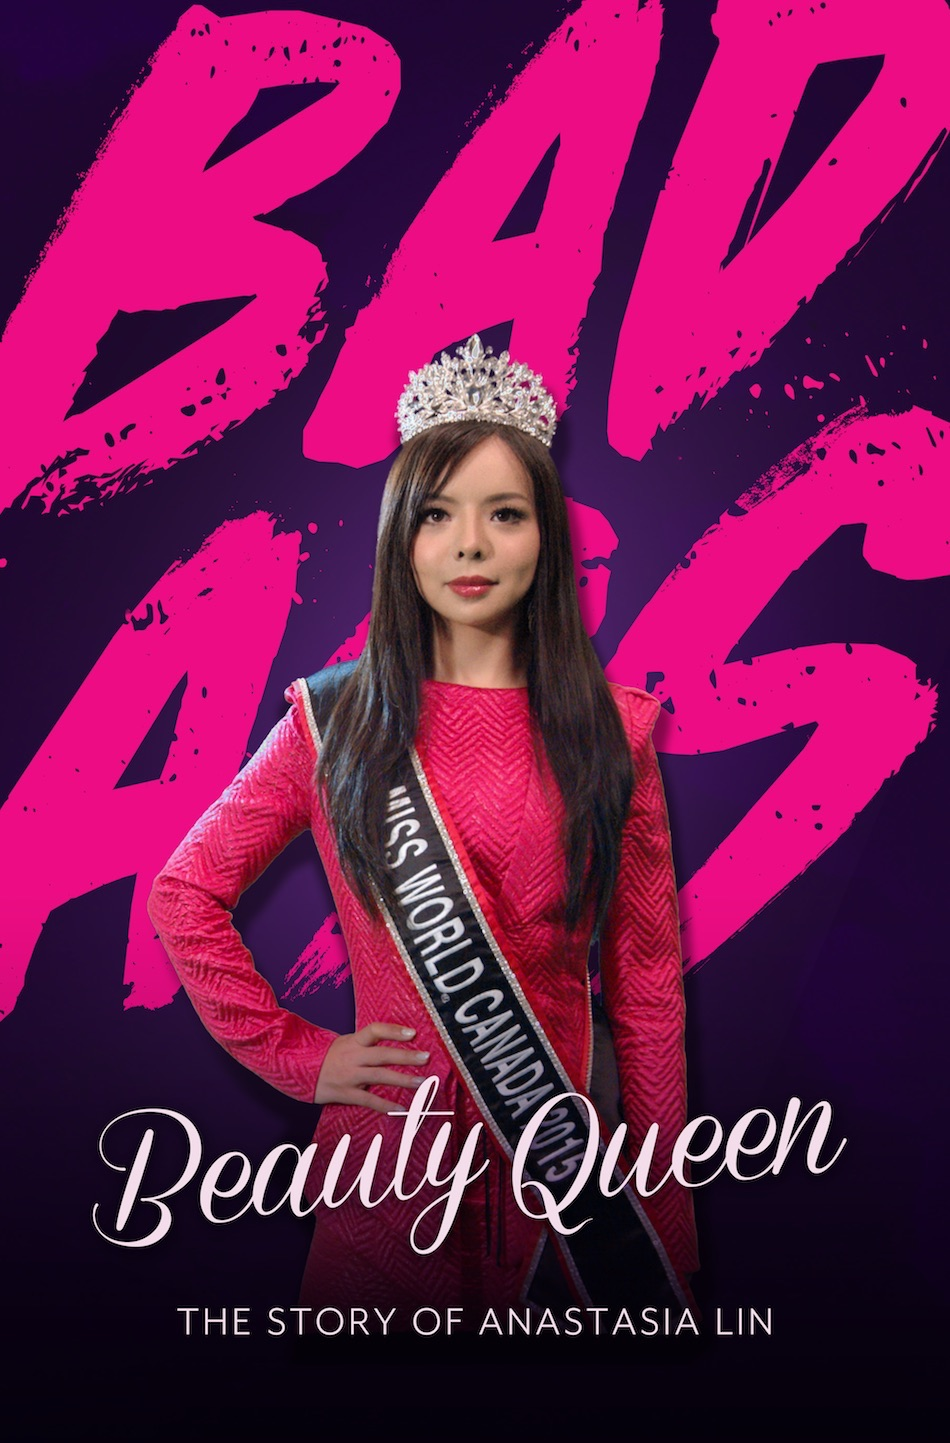 Badass Beauty Queen Poster. (Image via media kit Badass Beauty Queen Film)